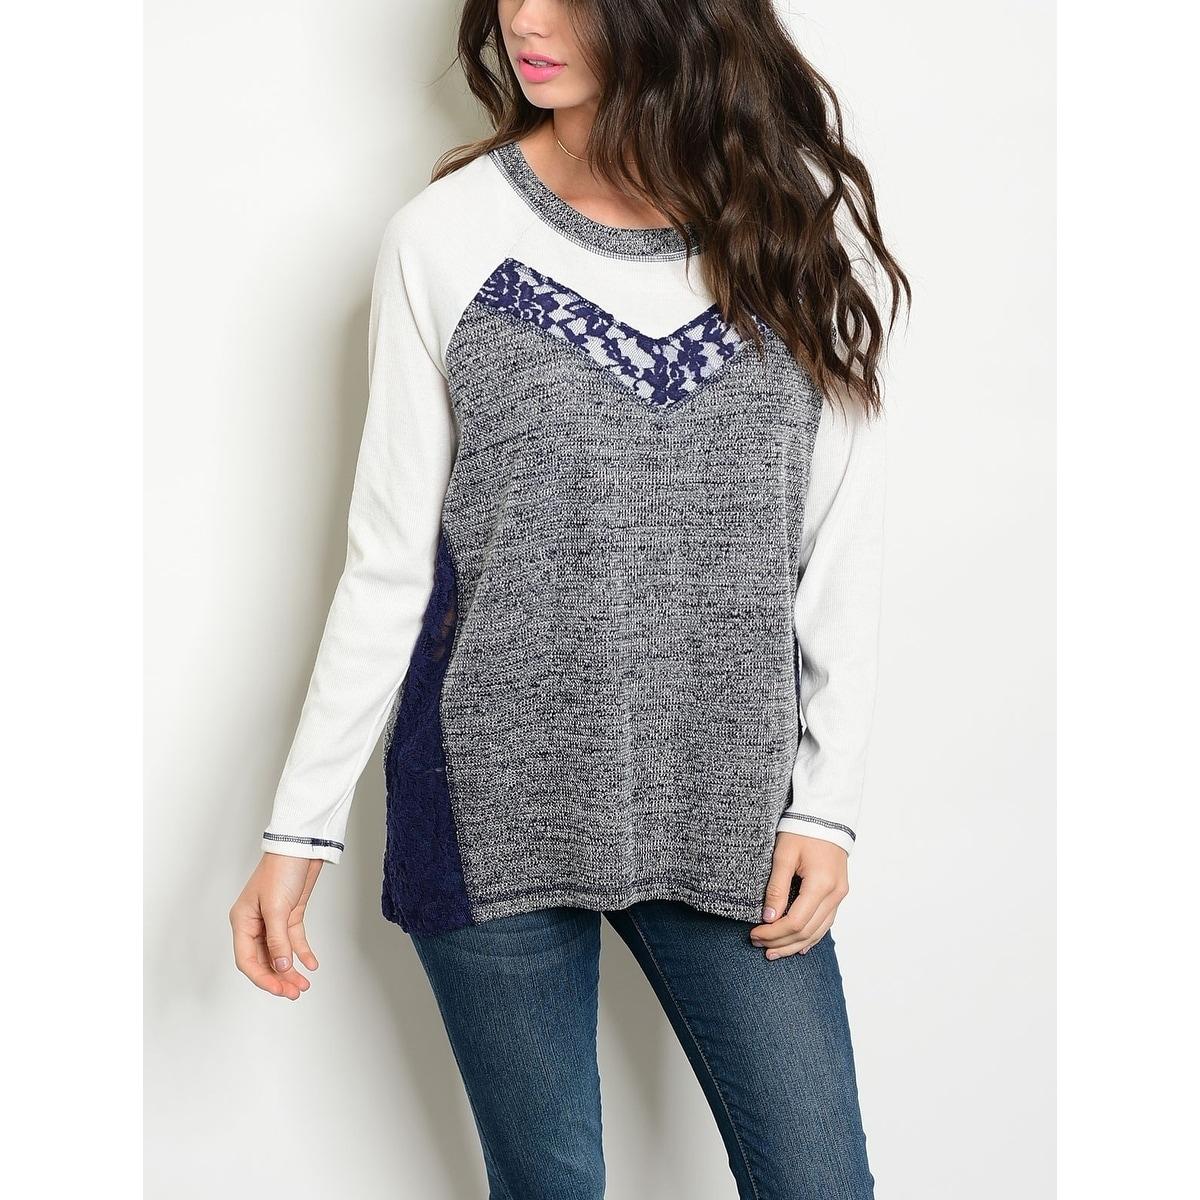 e4ded668ab Shop JED Women s Long Sleeve Lace Insert Light Knit Top - On Sale ...